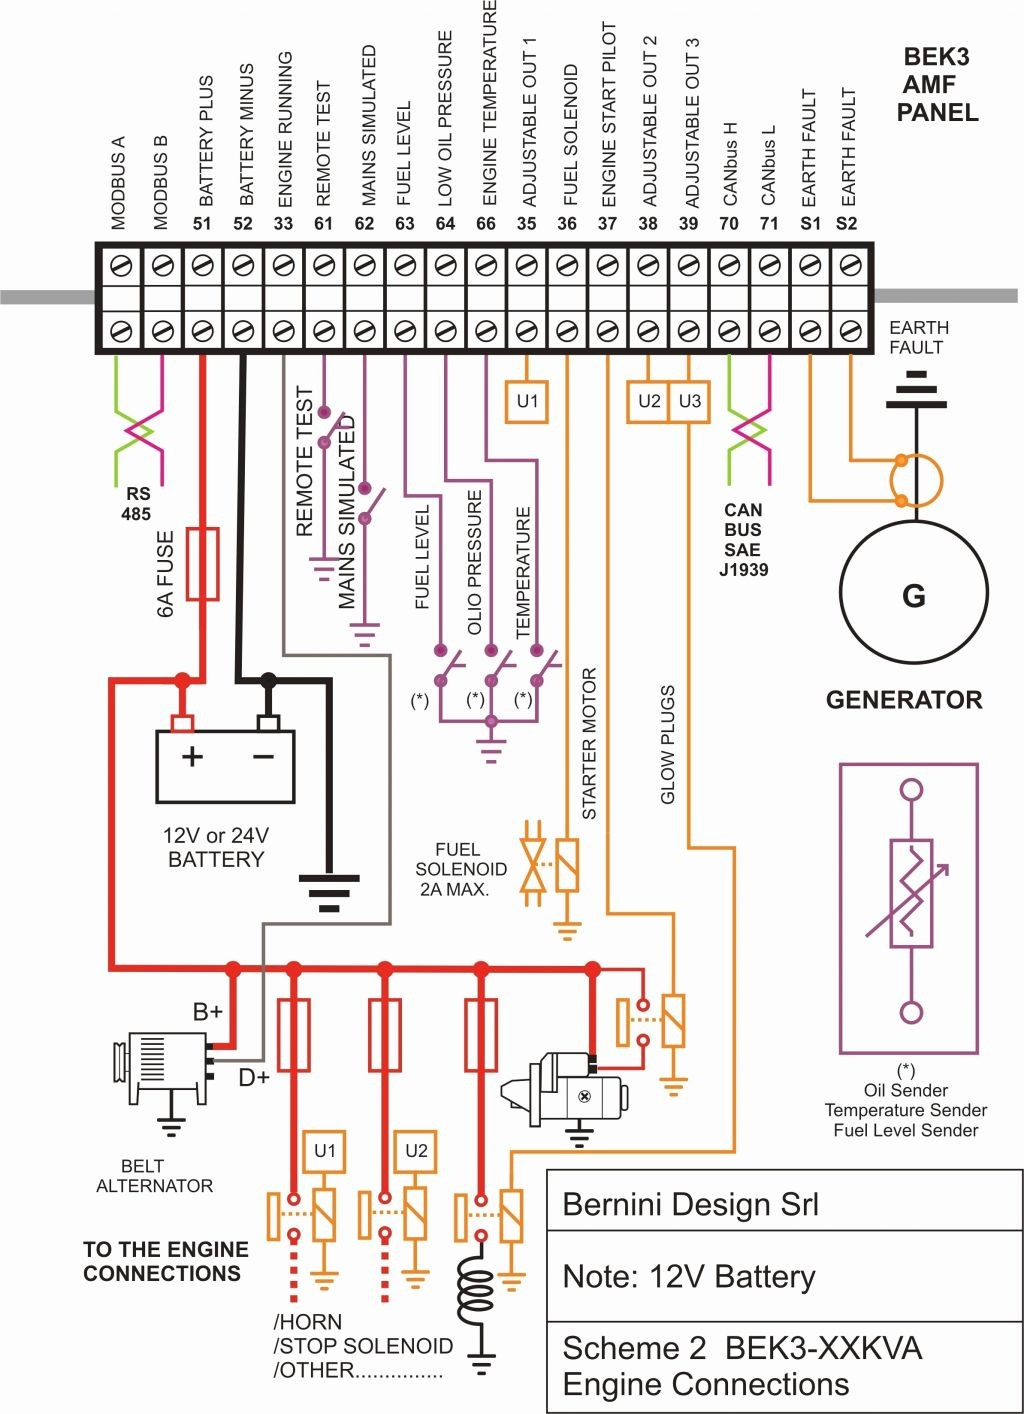 Wiring Diagram Beautiful House Wiring Diagram Electrical Floor Plan 2004 2010 Bmw X3 E83 3 0d